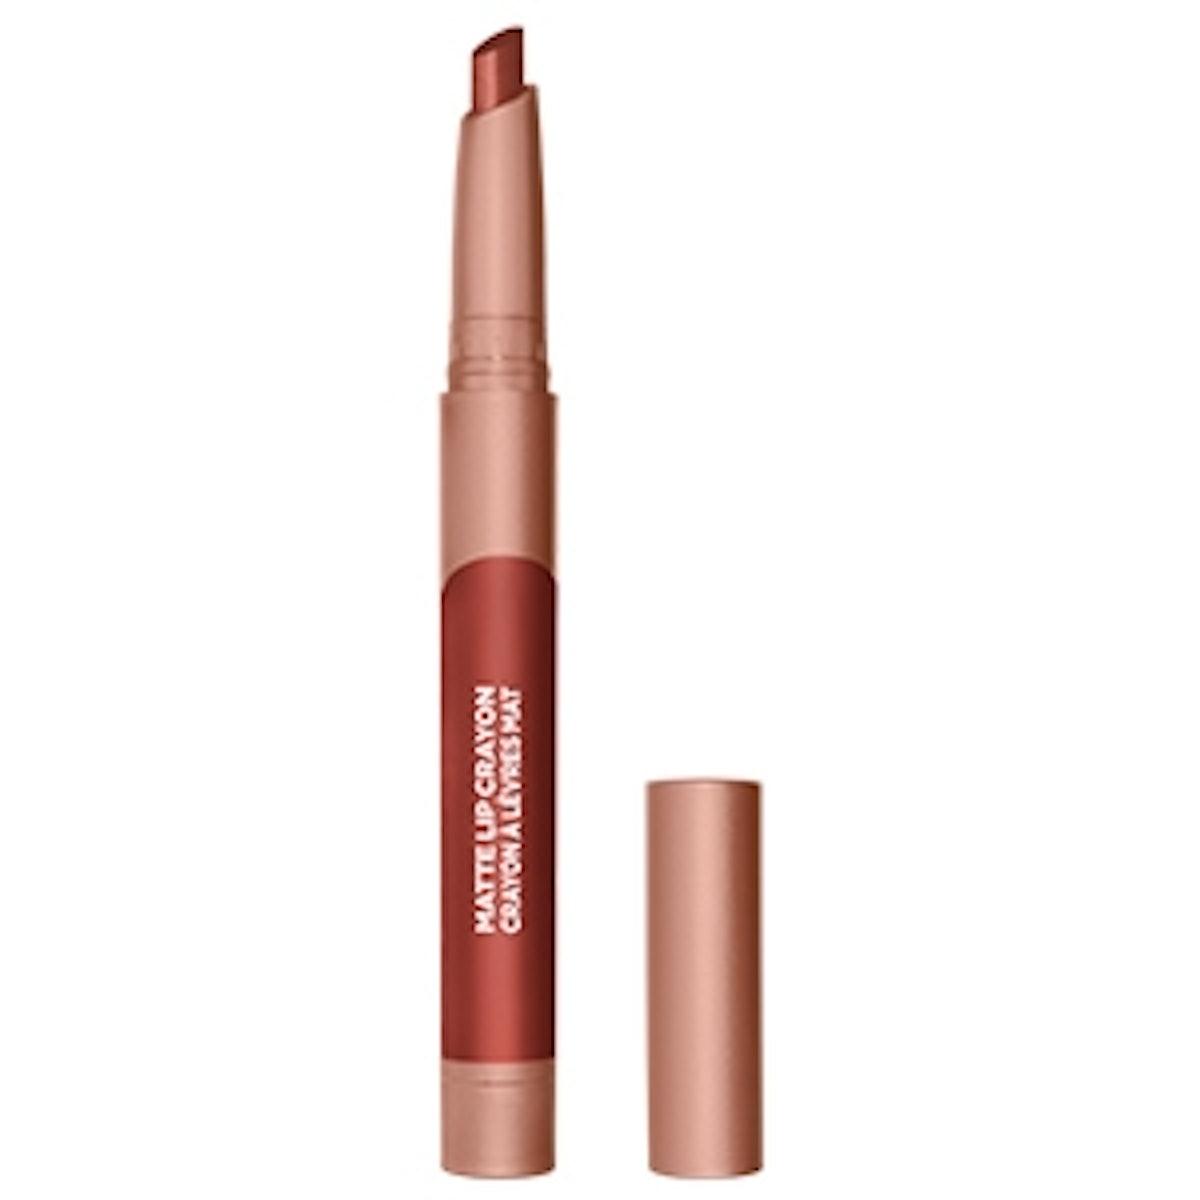 INFALLIBLE® Matte Lip Crayon in Flirty Toffee